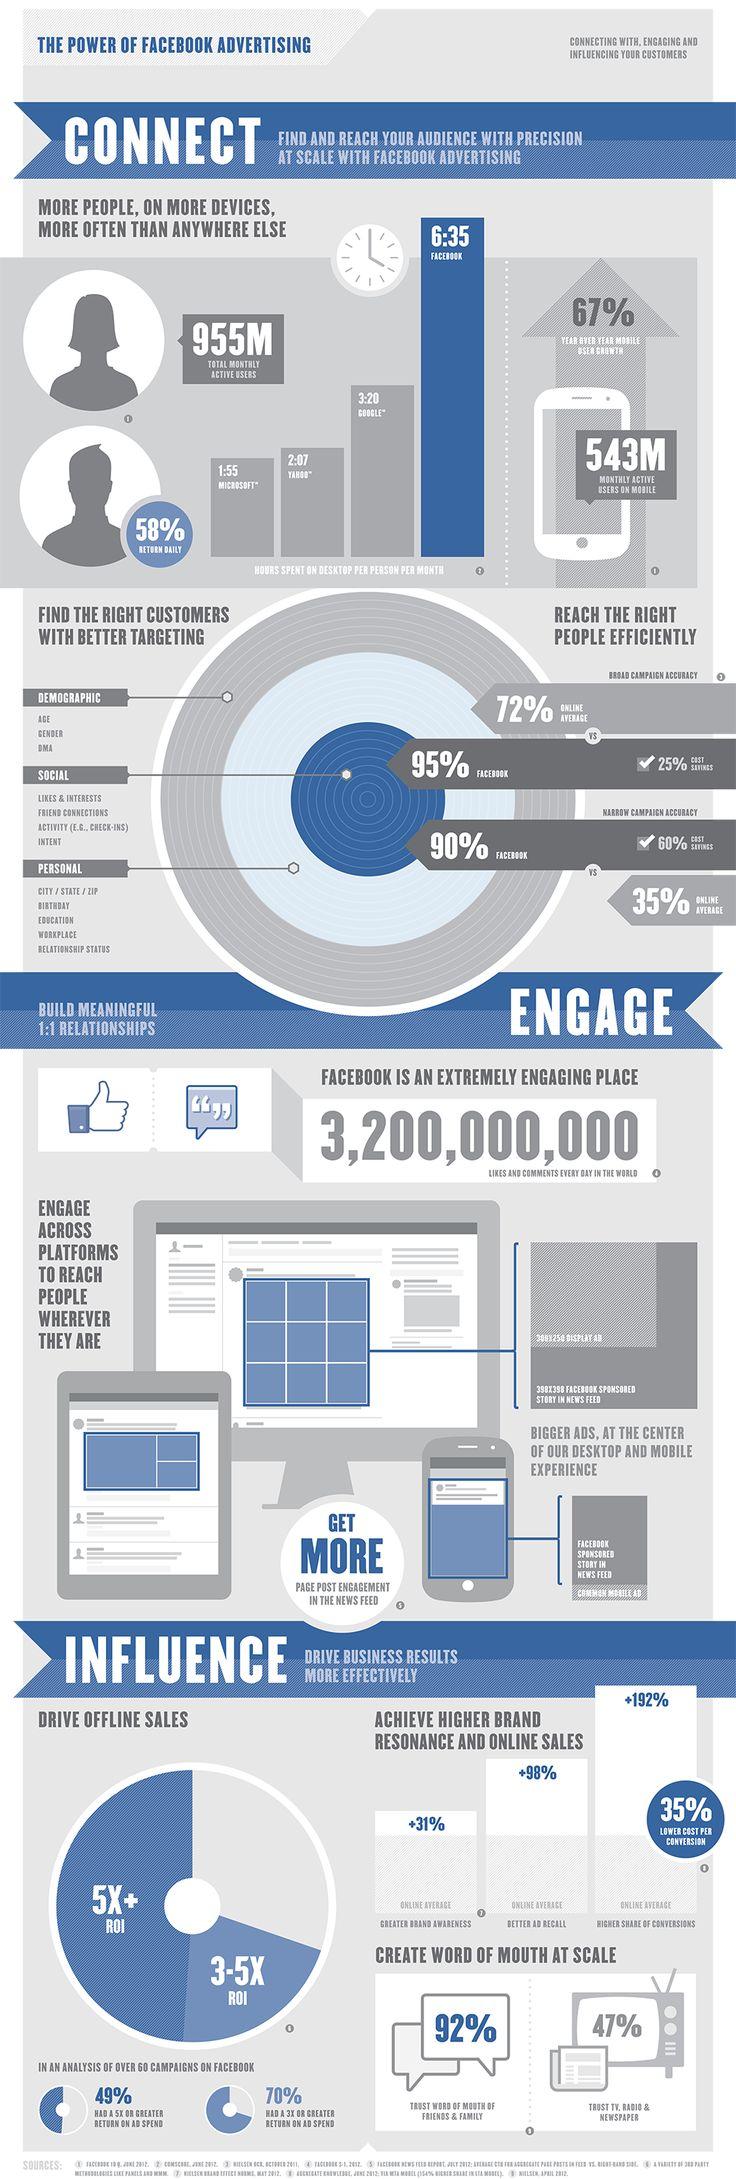 Facebook sees 3.2 billion like